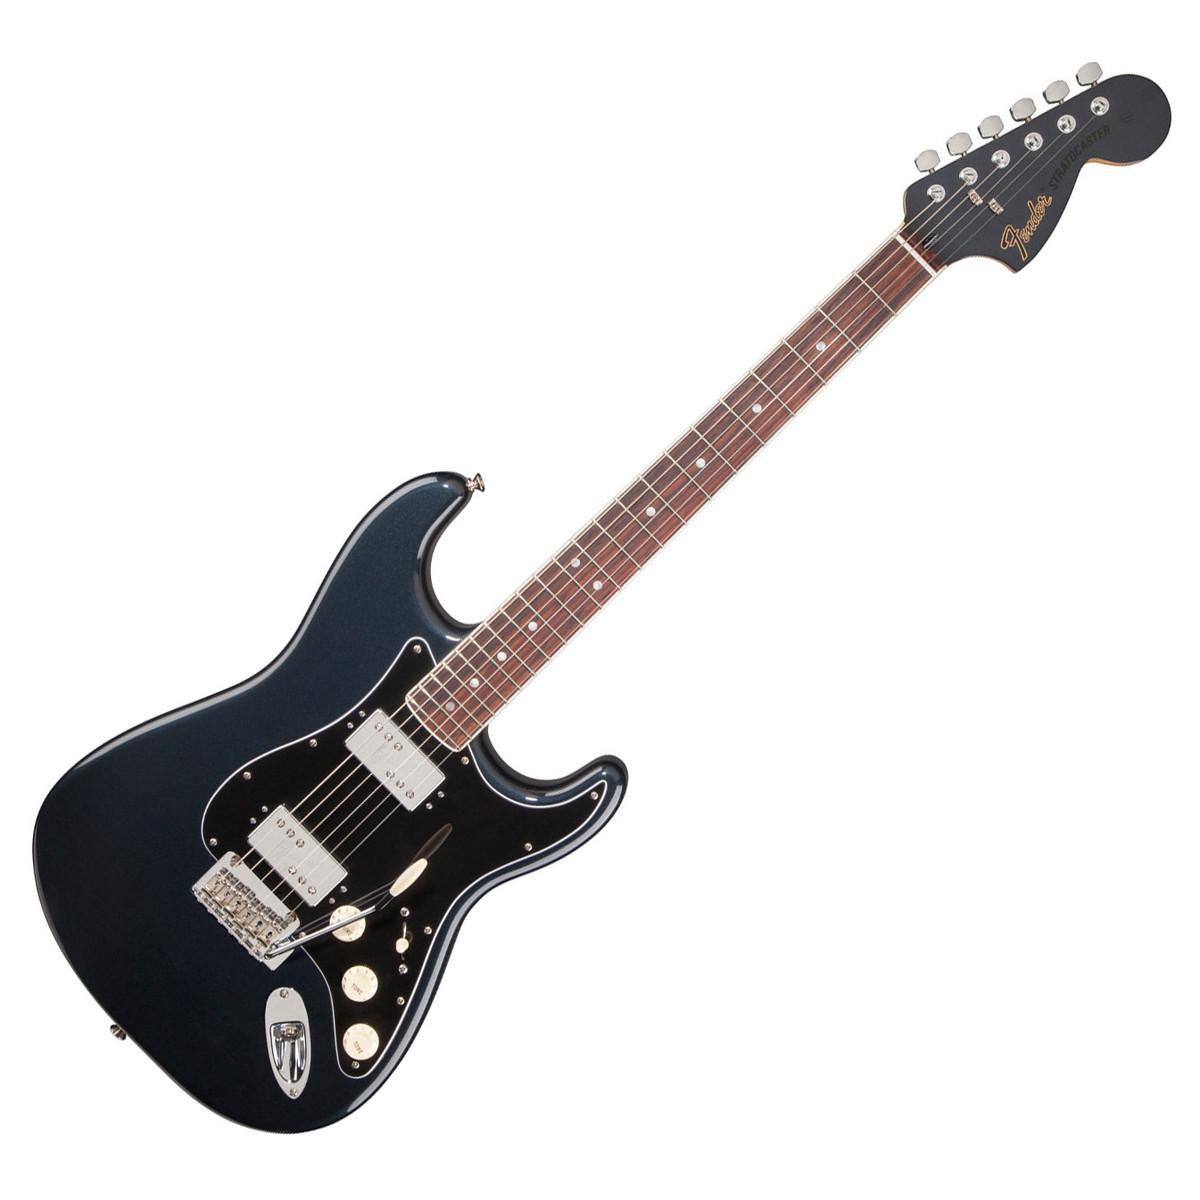 disc fender classic player strat hh guitar bound dark mercedes blue at. Black Bedroom Furniture Sets. Home Design Ideas